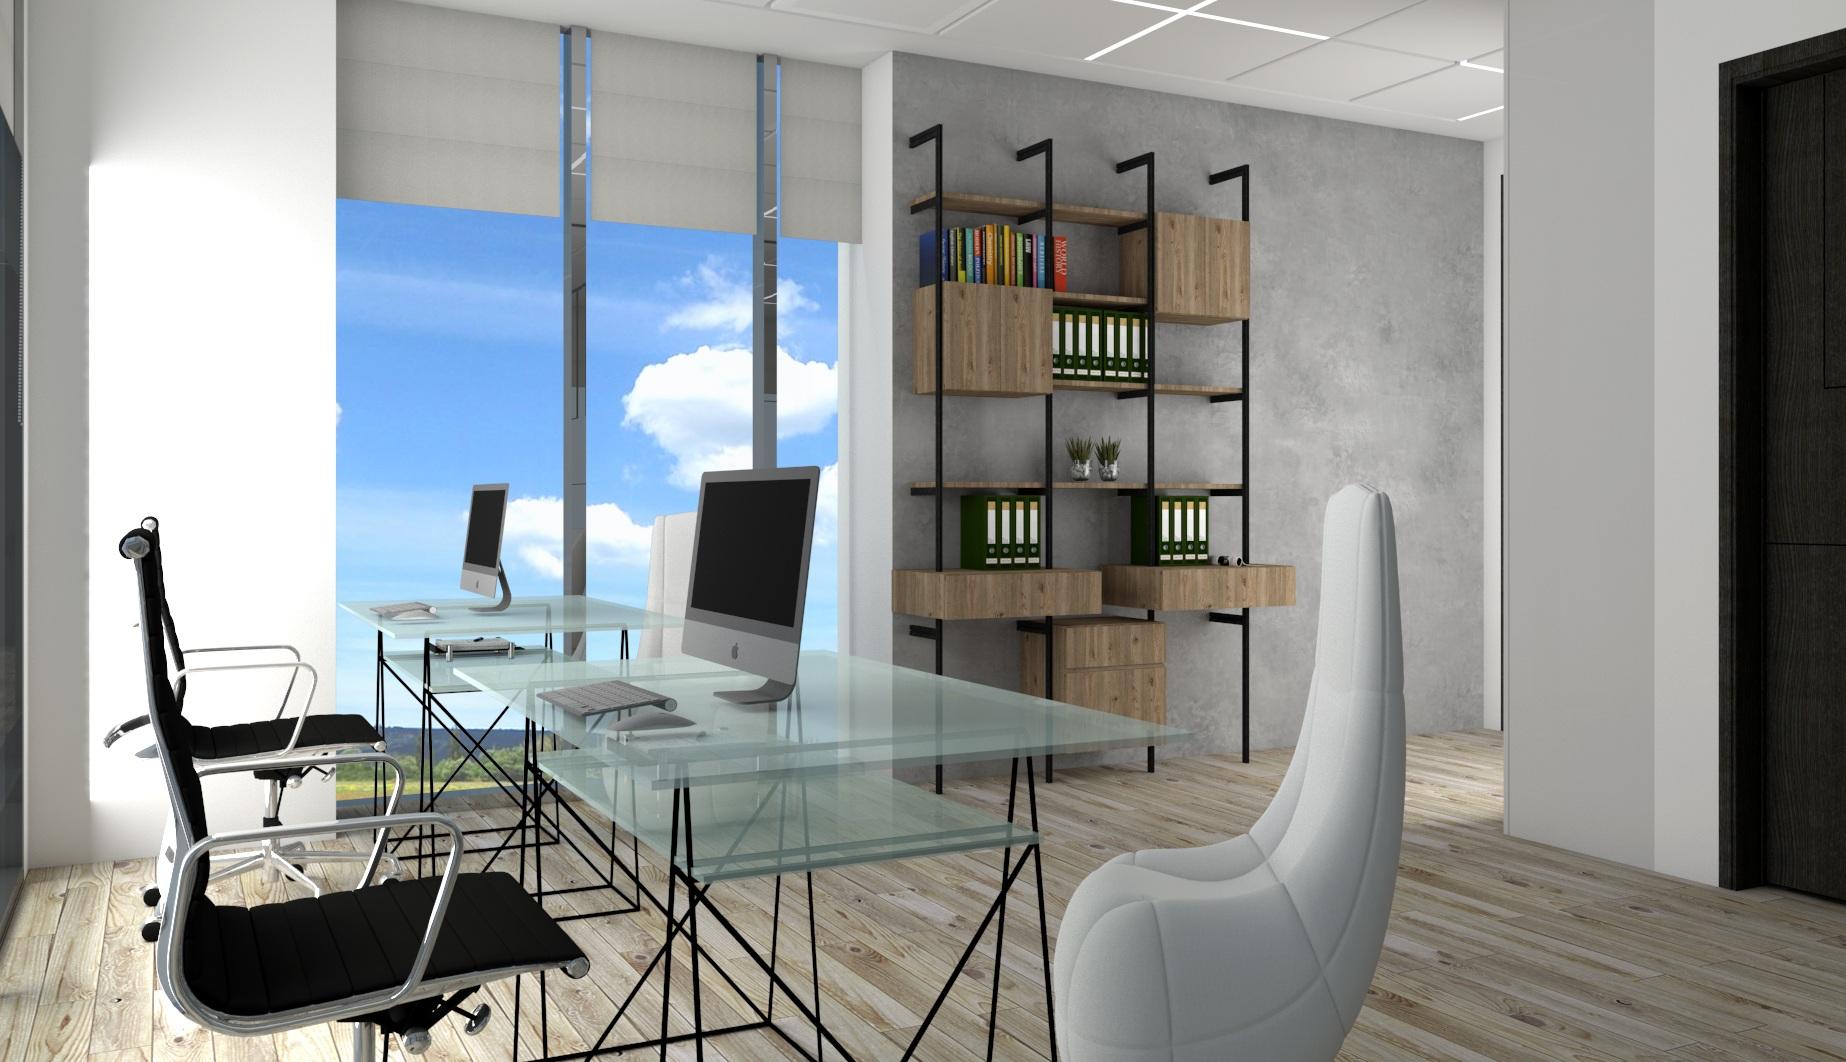 Celsus Business Ofis